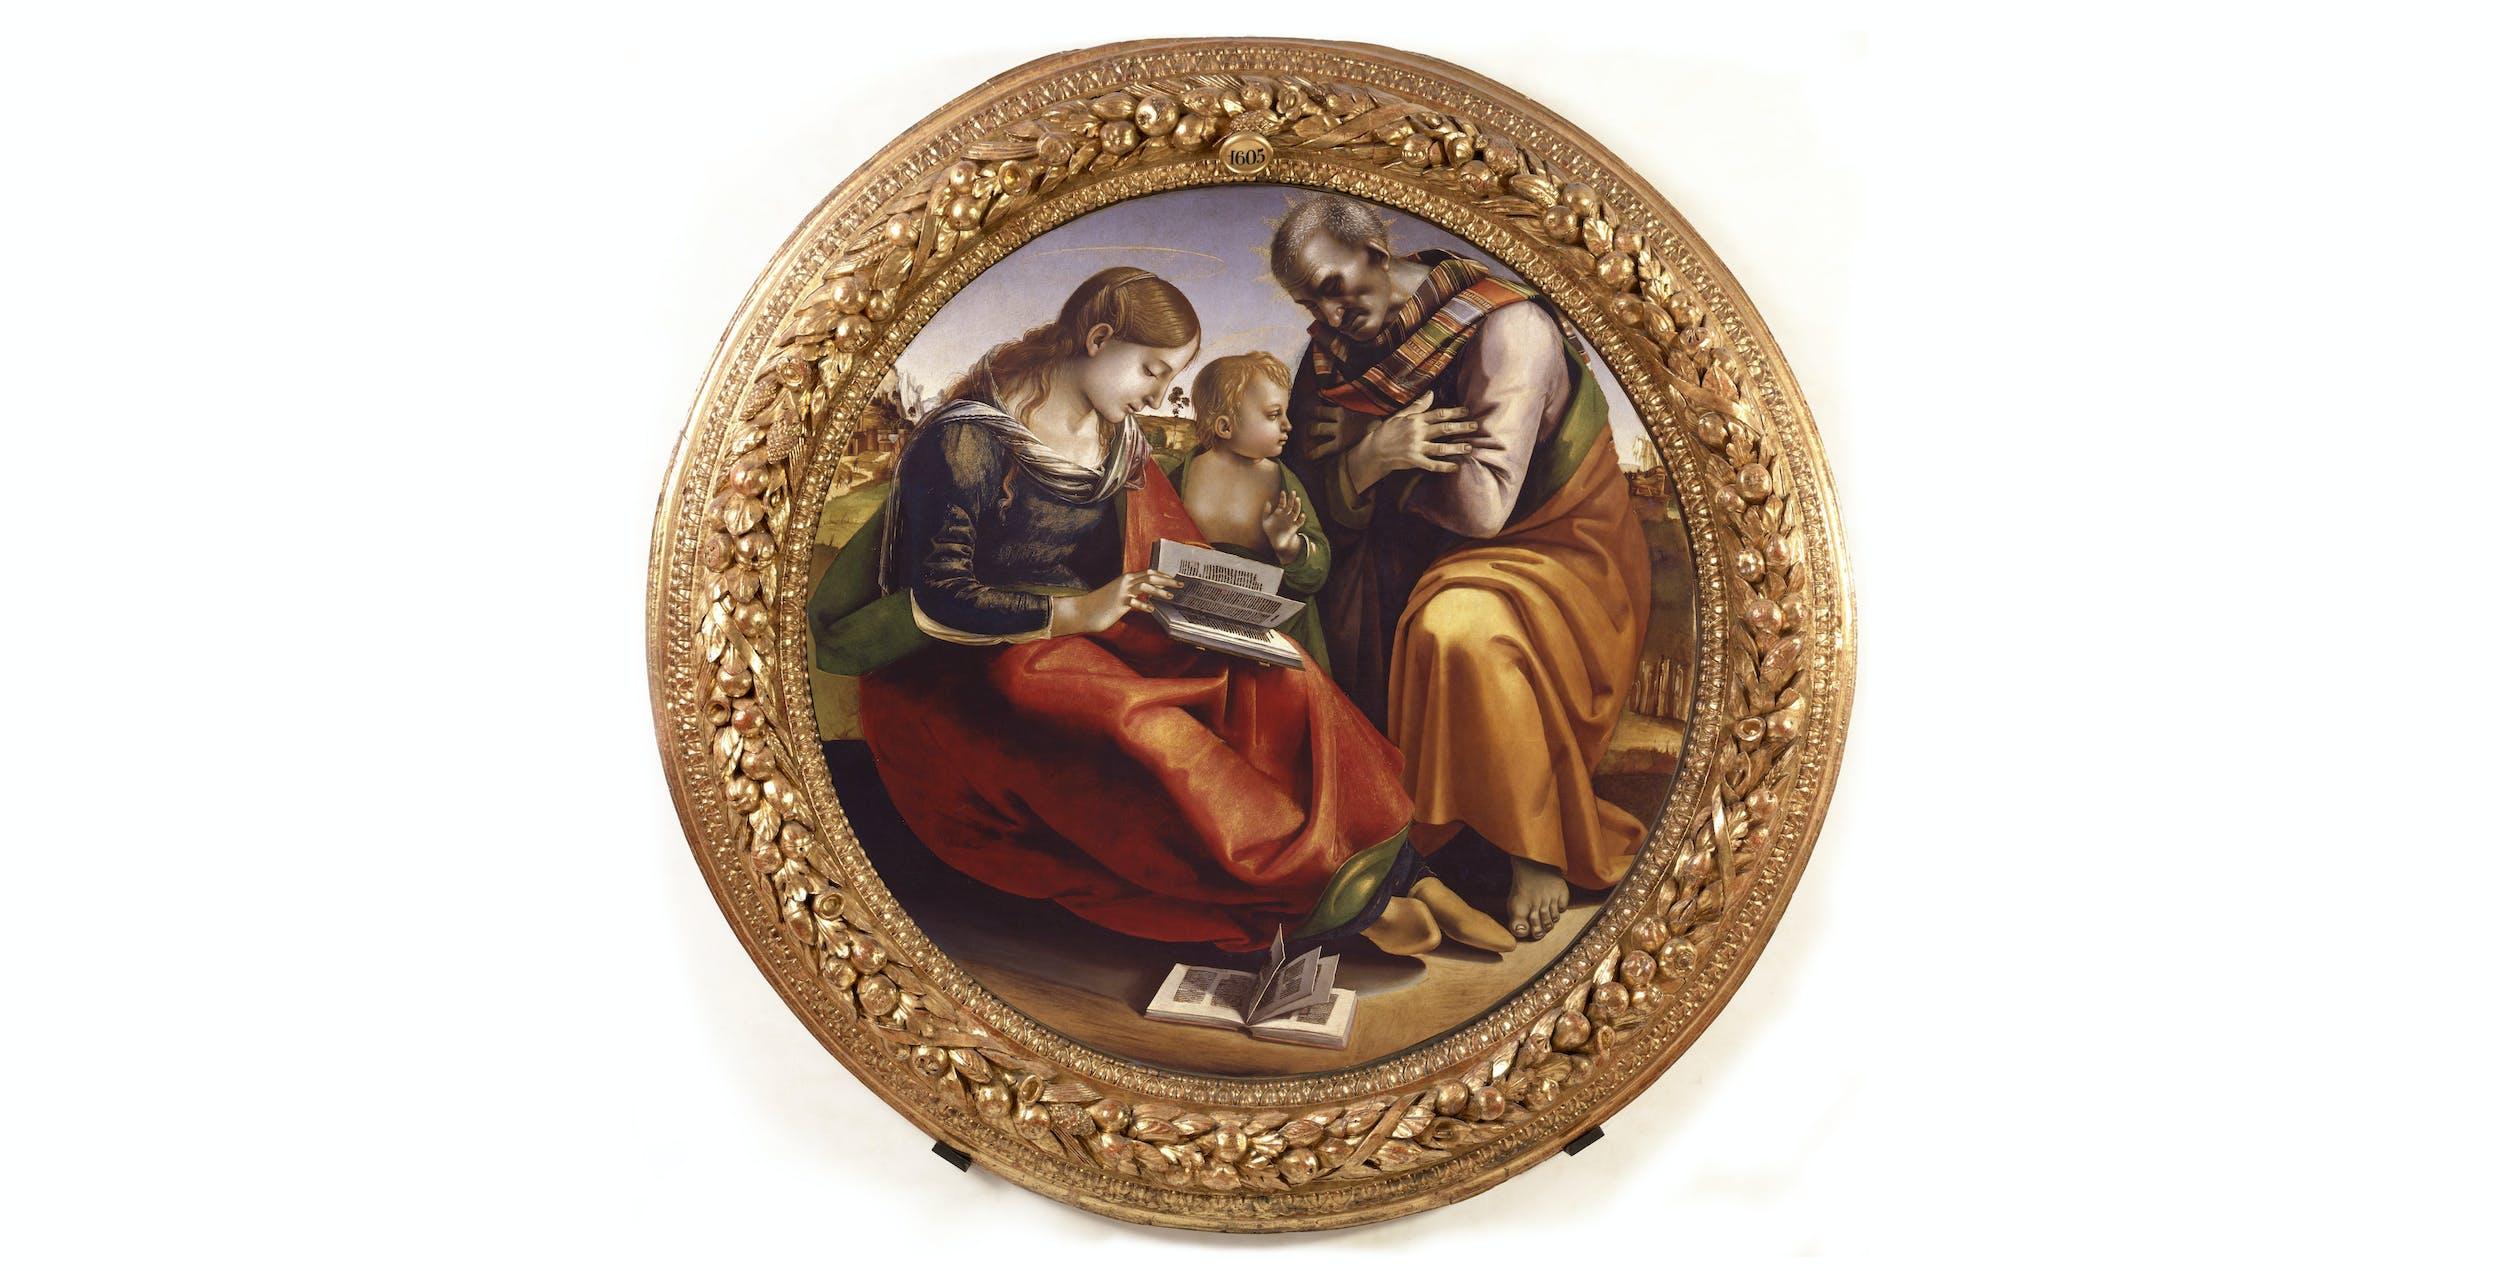 Luca Signorelli, Sacra Famiglia I Luca Signorelli, Holy Family